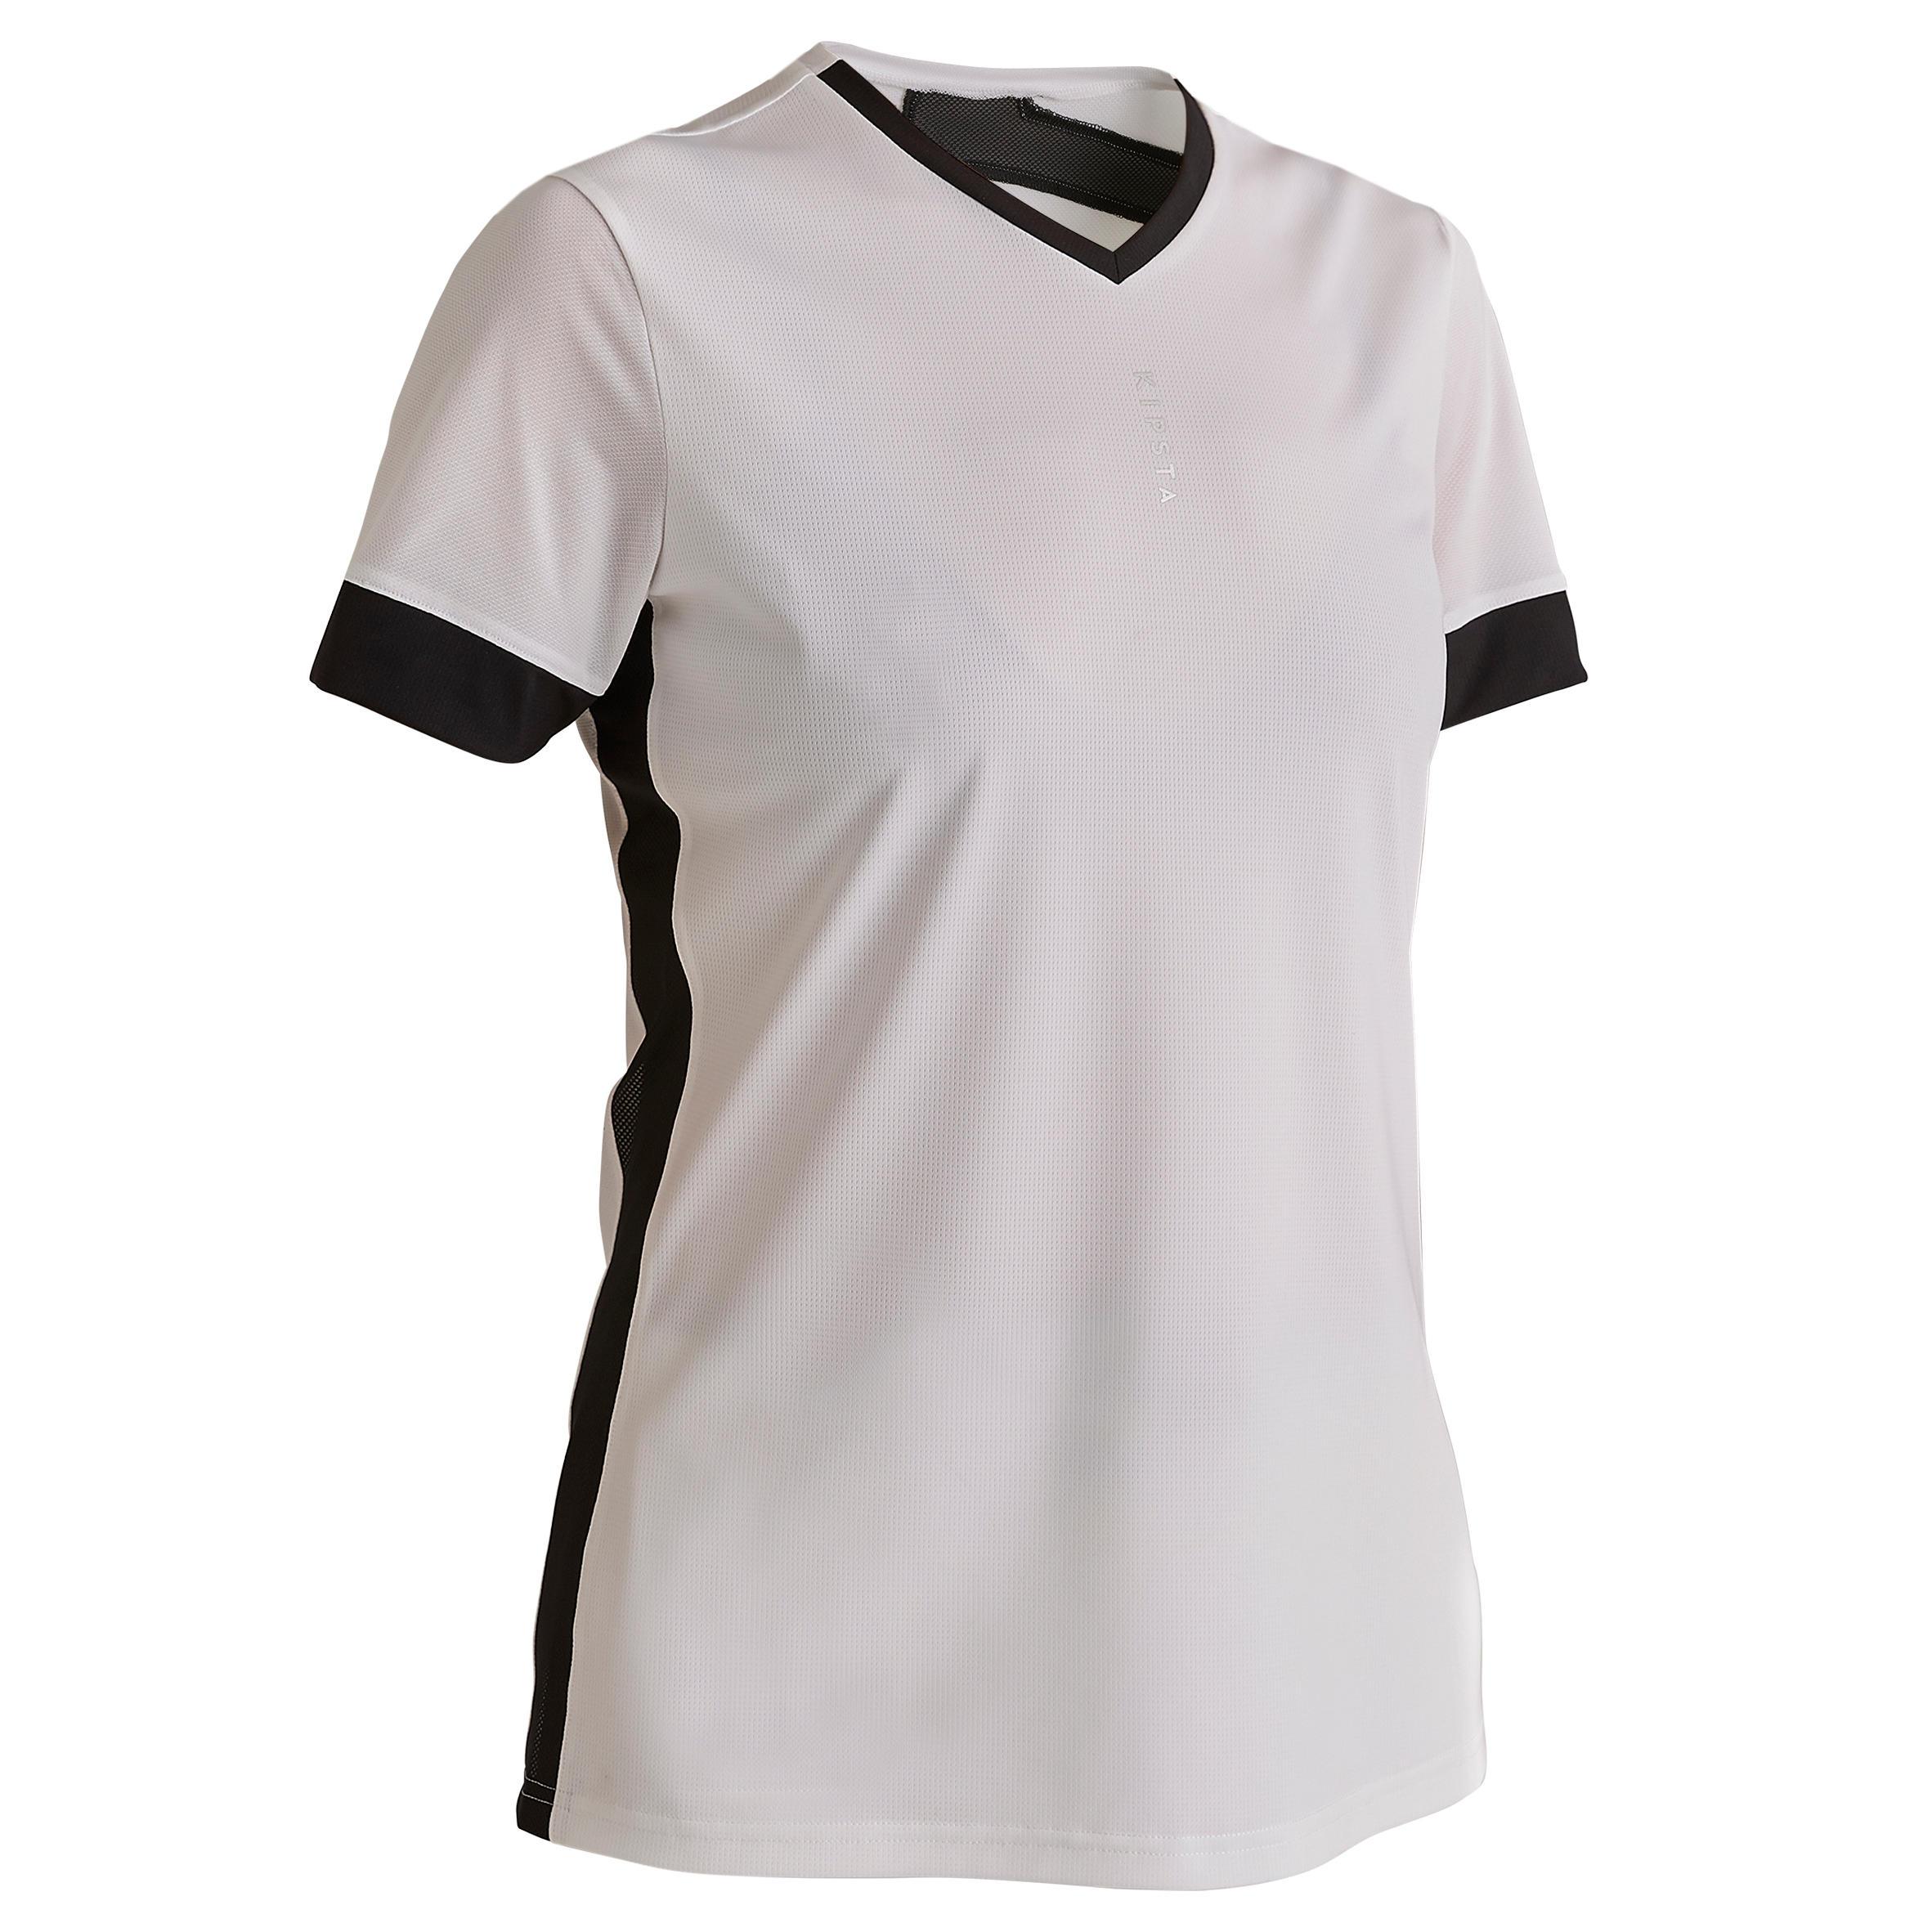 Kipsta Voetbalshirt dames F500